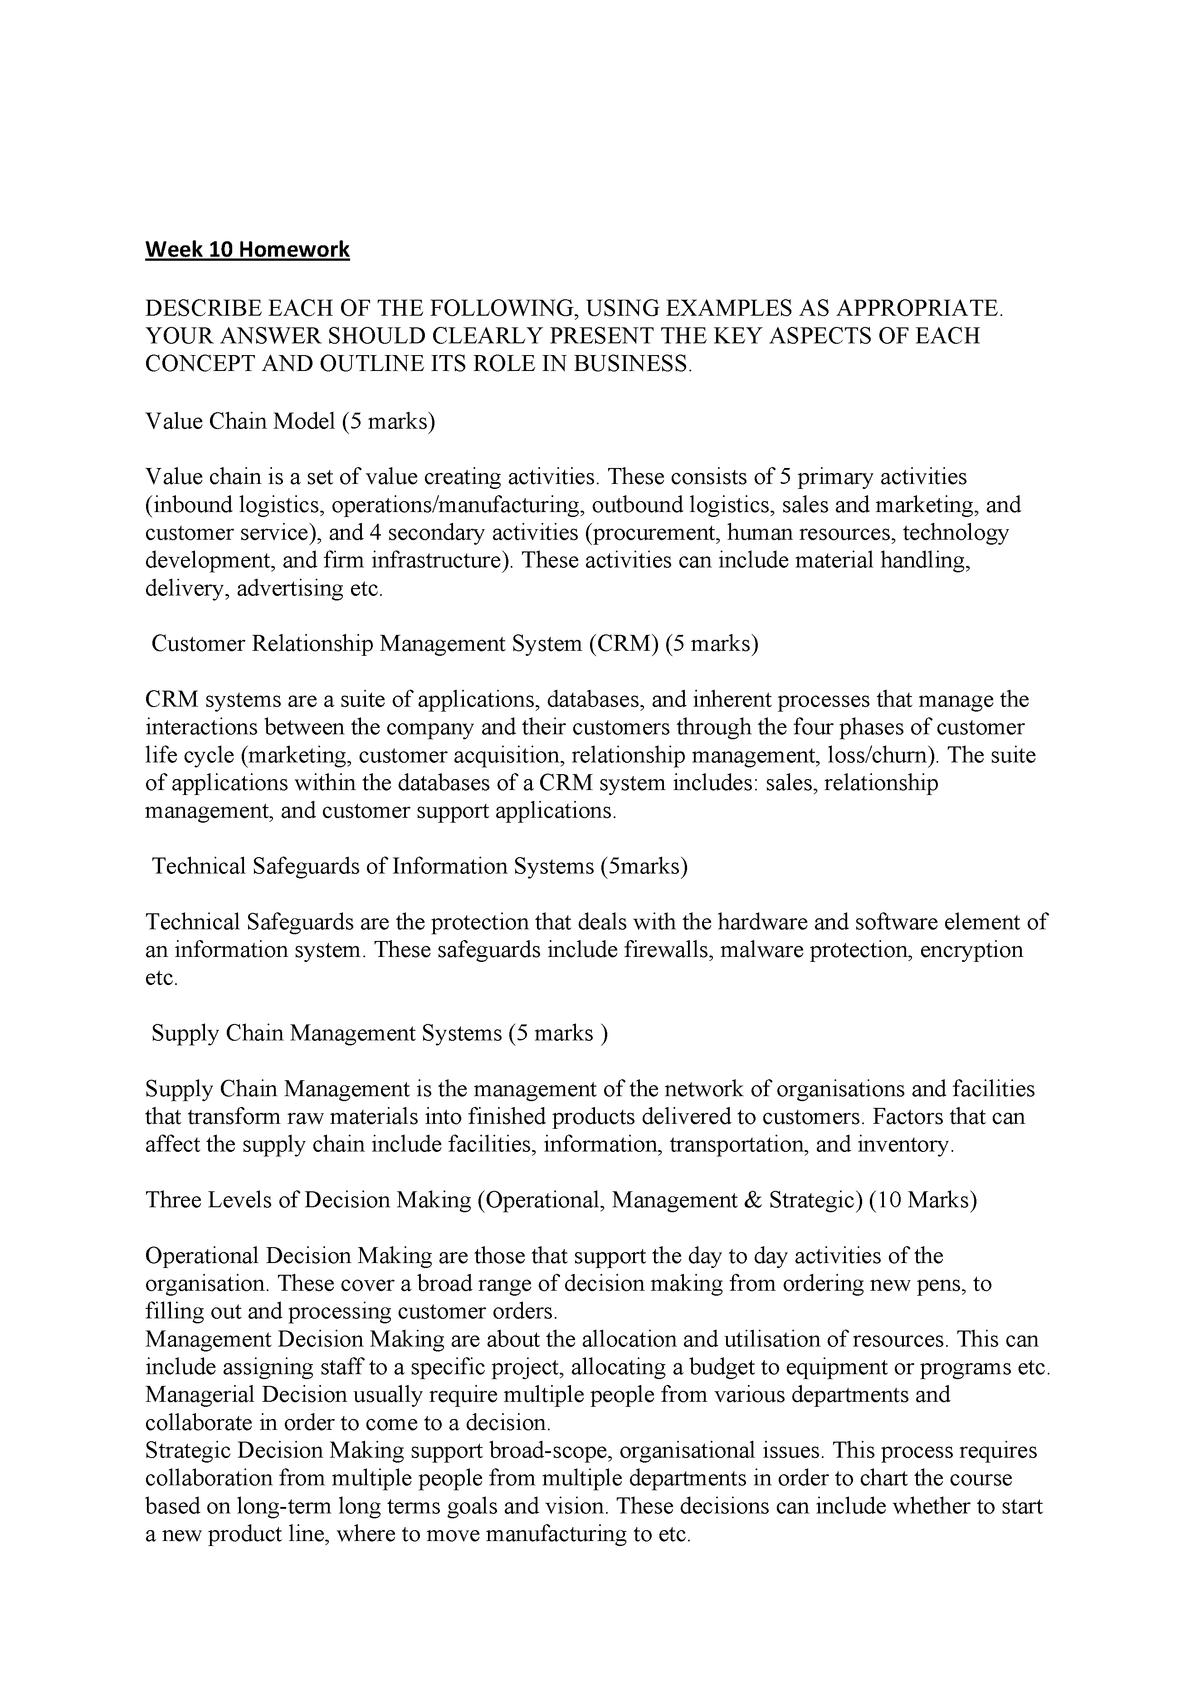 Week 10 Homework - 1602: INFS - StuDocu